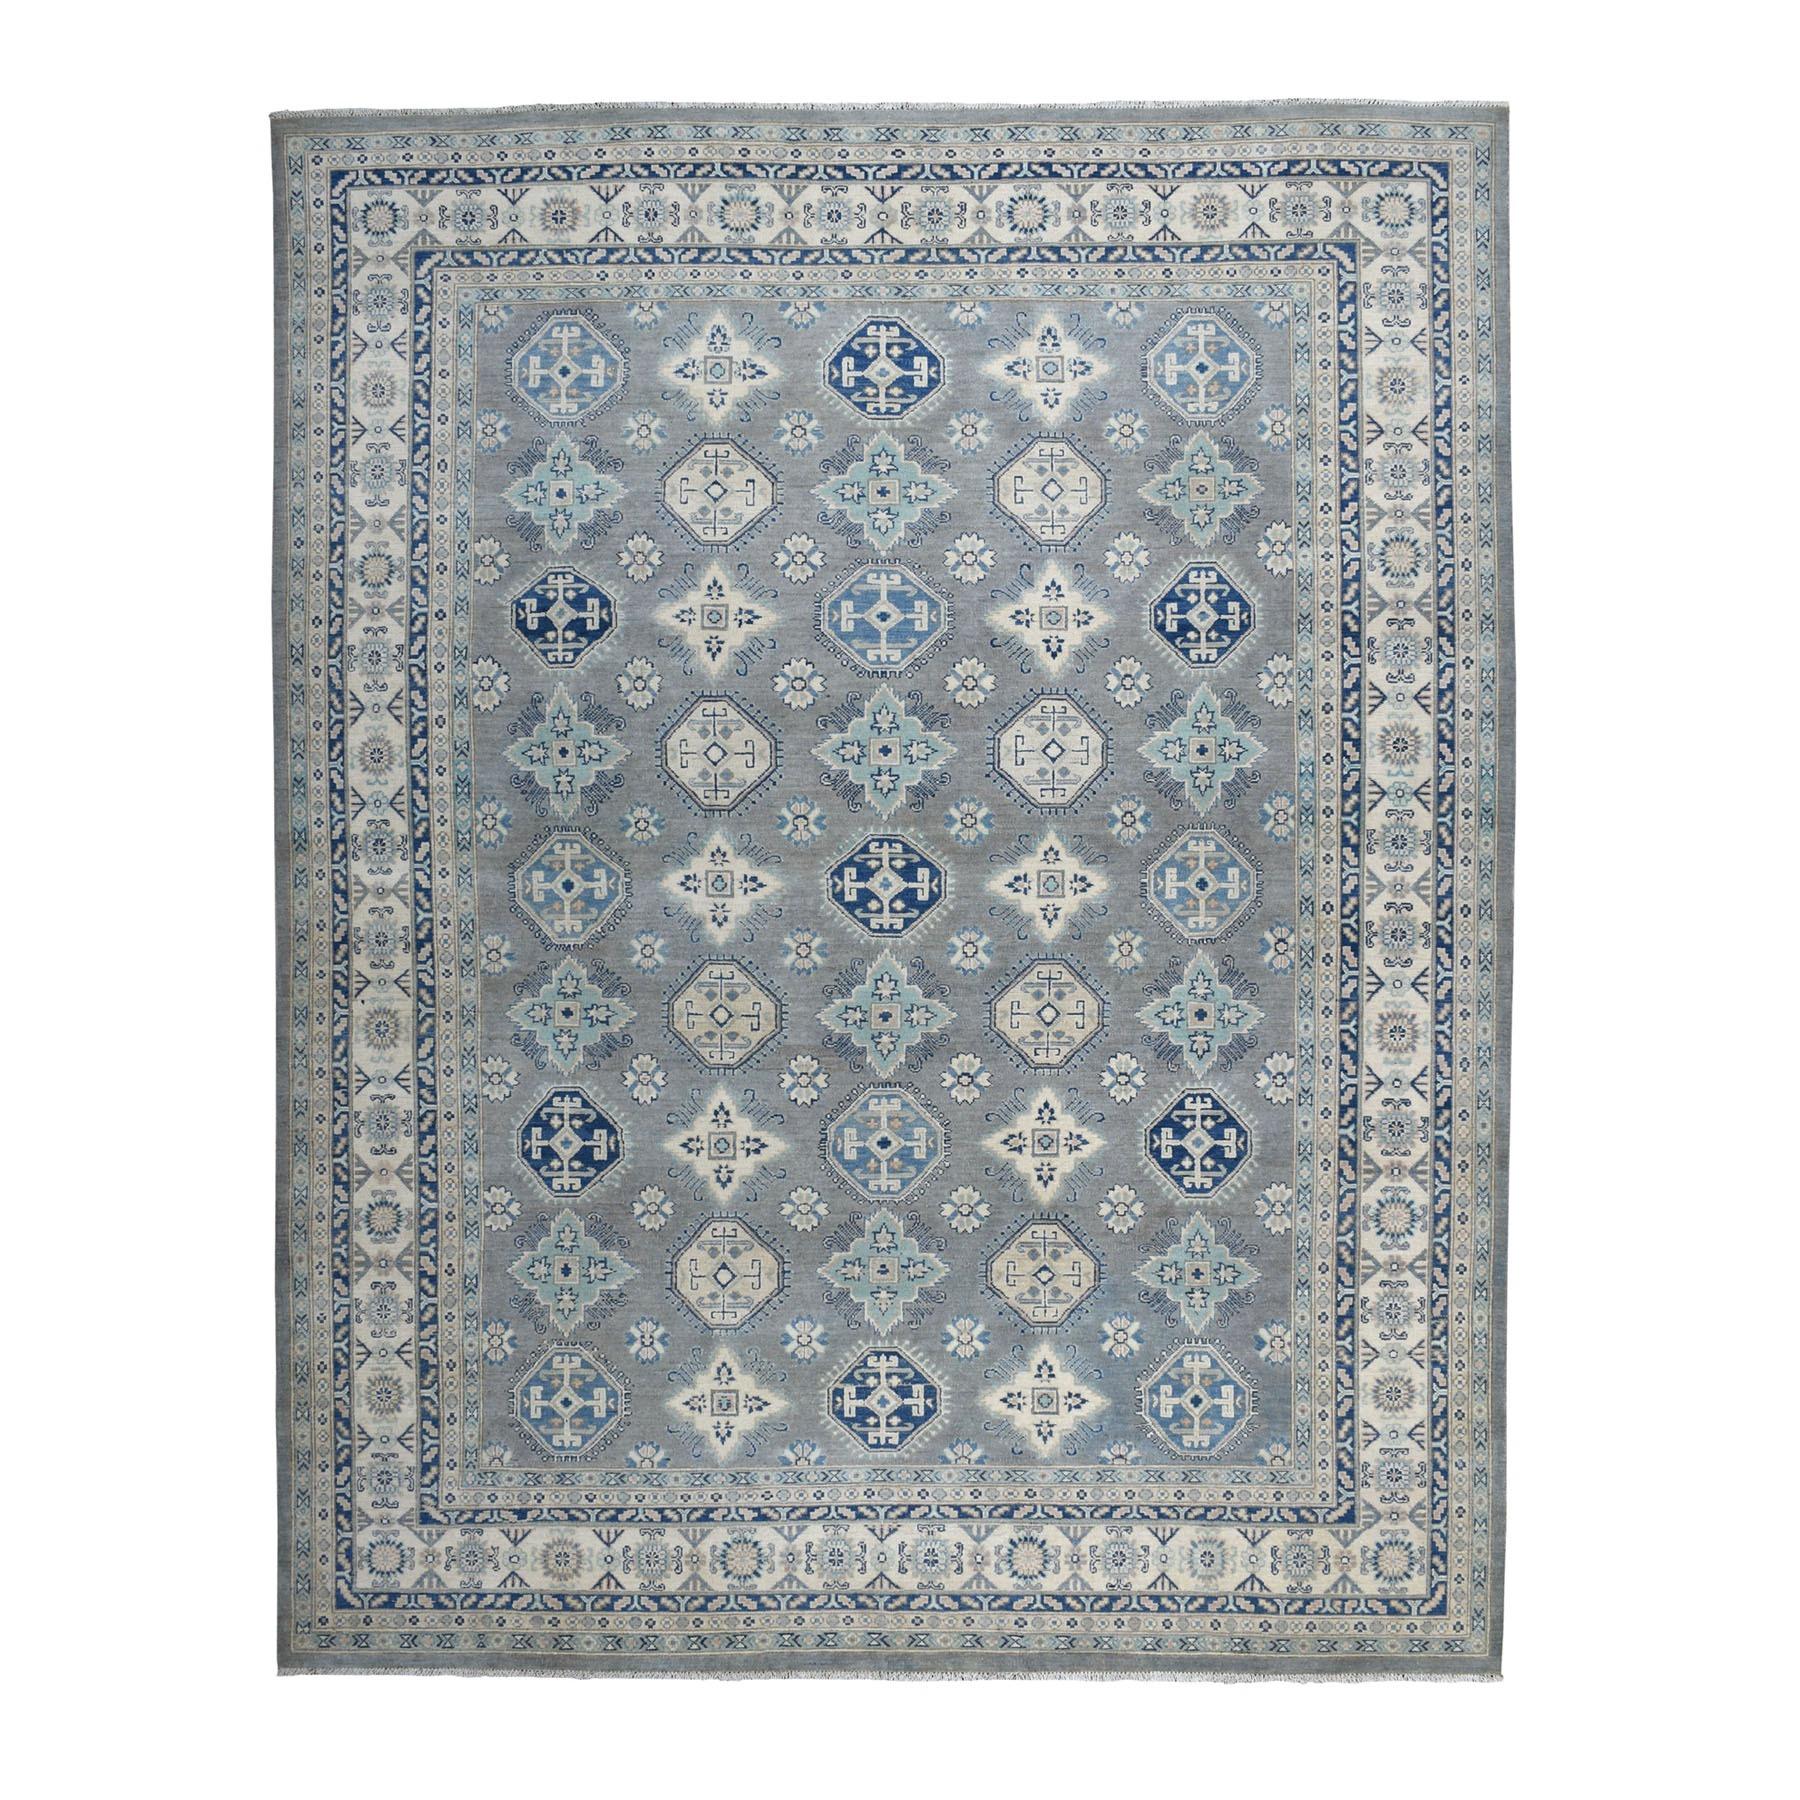 "8'9""X11'4"" Gray Vintage Look Kazak Geometric Design Pure Wool Hand Knotted Oriental Rug moaebaed"